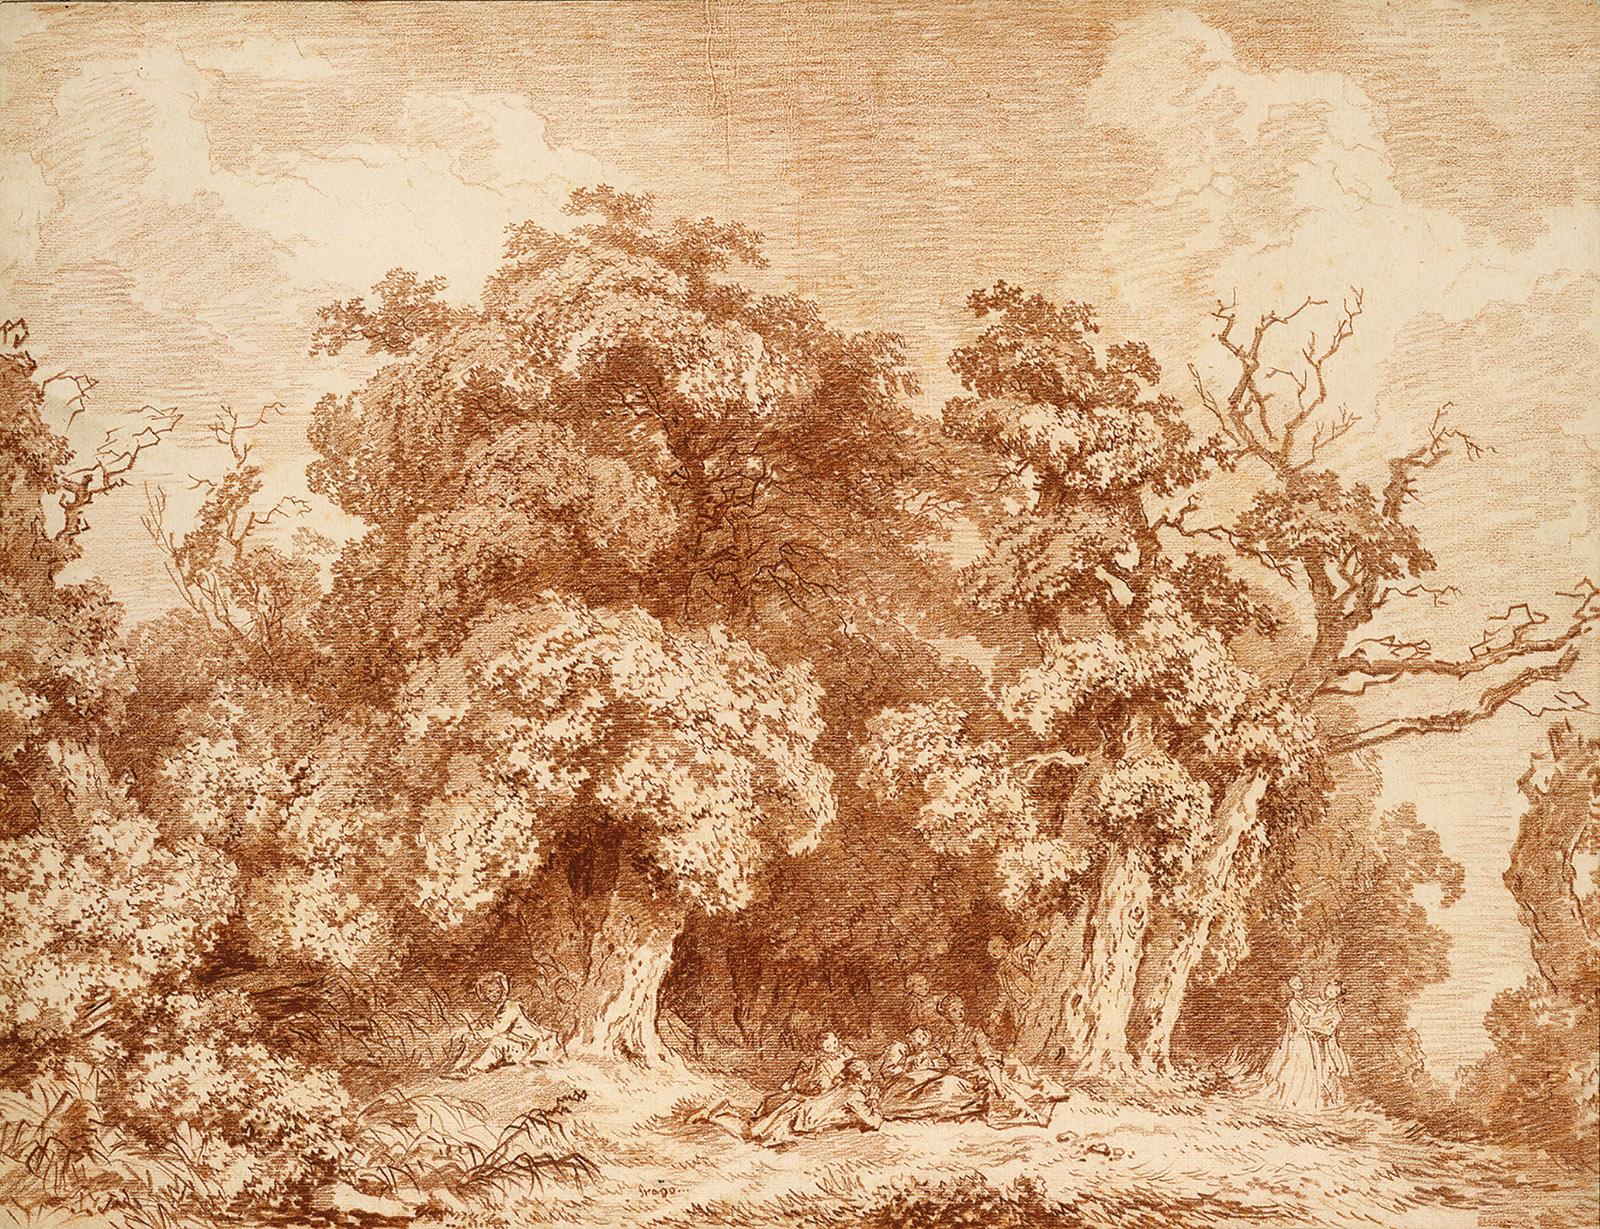 Jean-Honoré Fragonard: A Gathering at Wood's Edge, circa 1770–1773